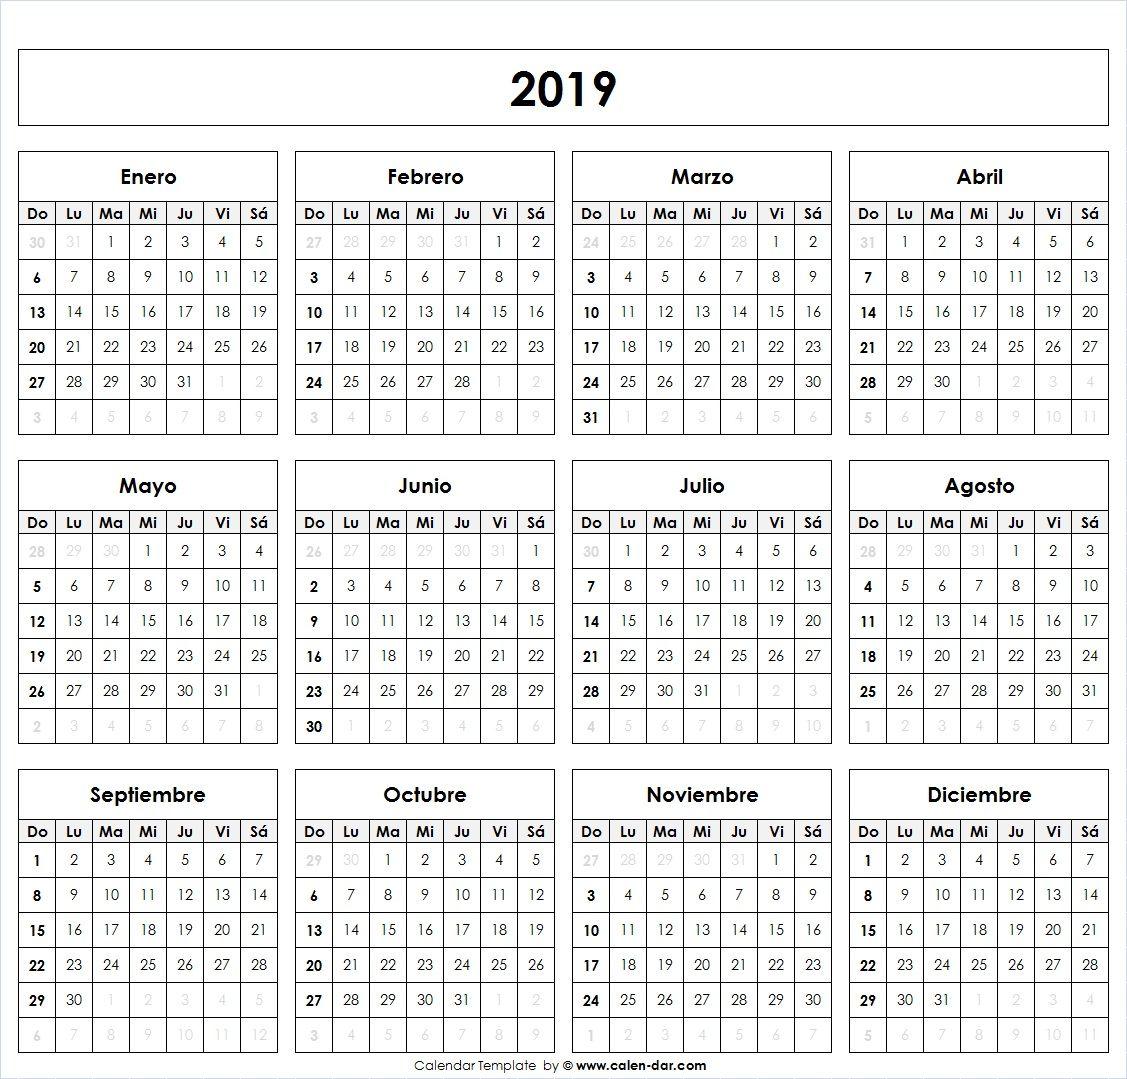 Calendario 2019 De Portugal Con Los Dias Festivos Calendario 2019